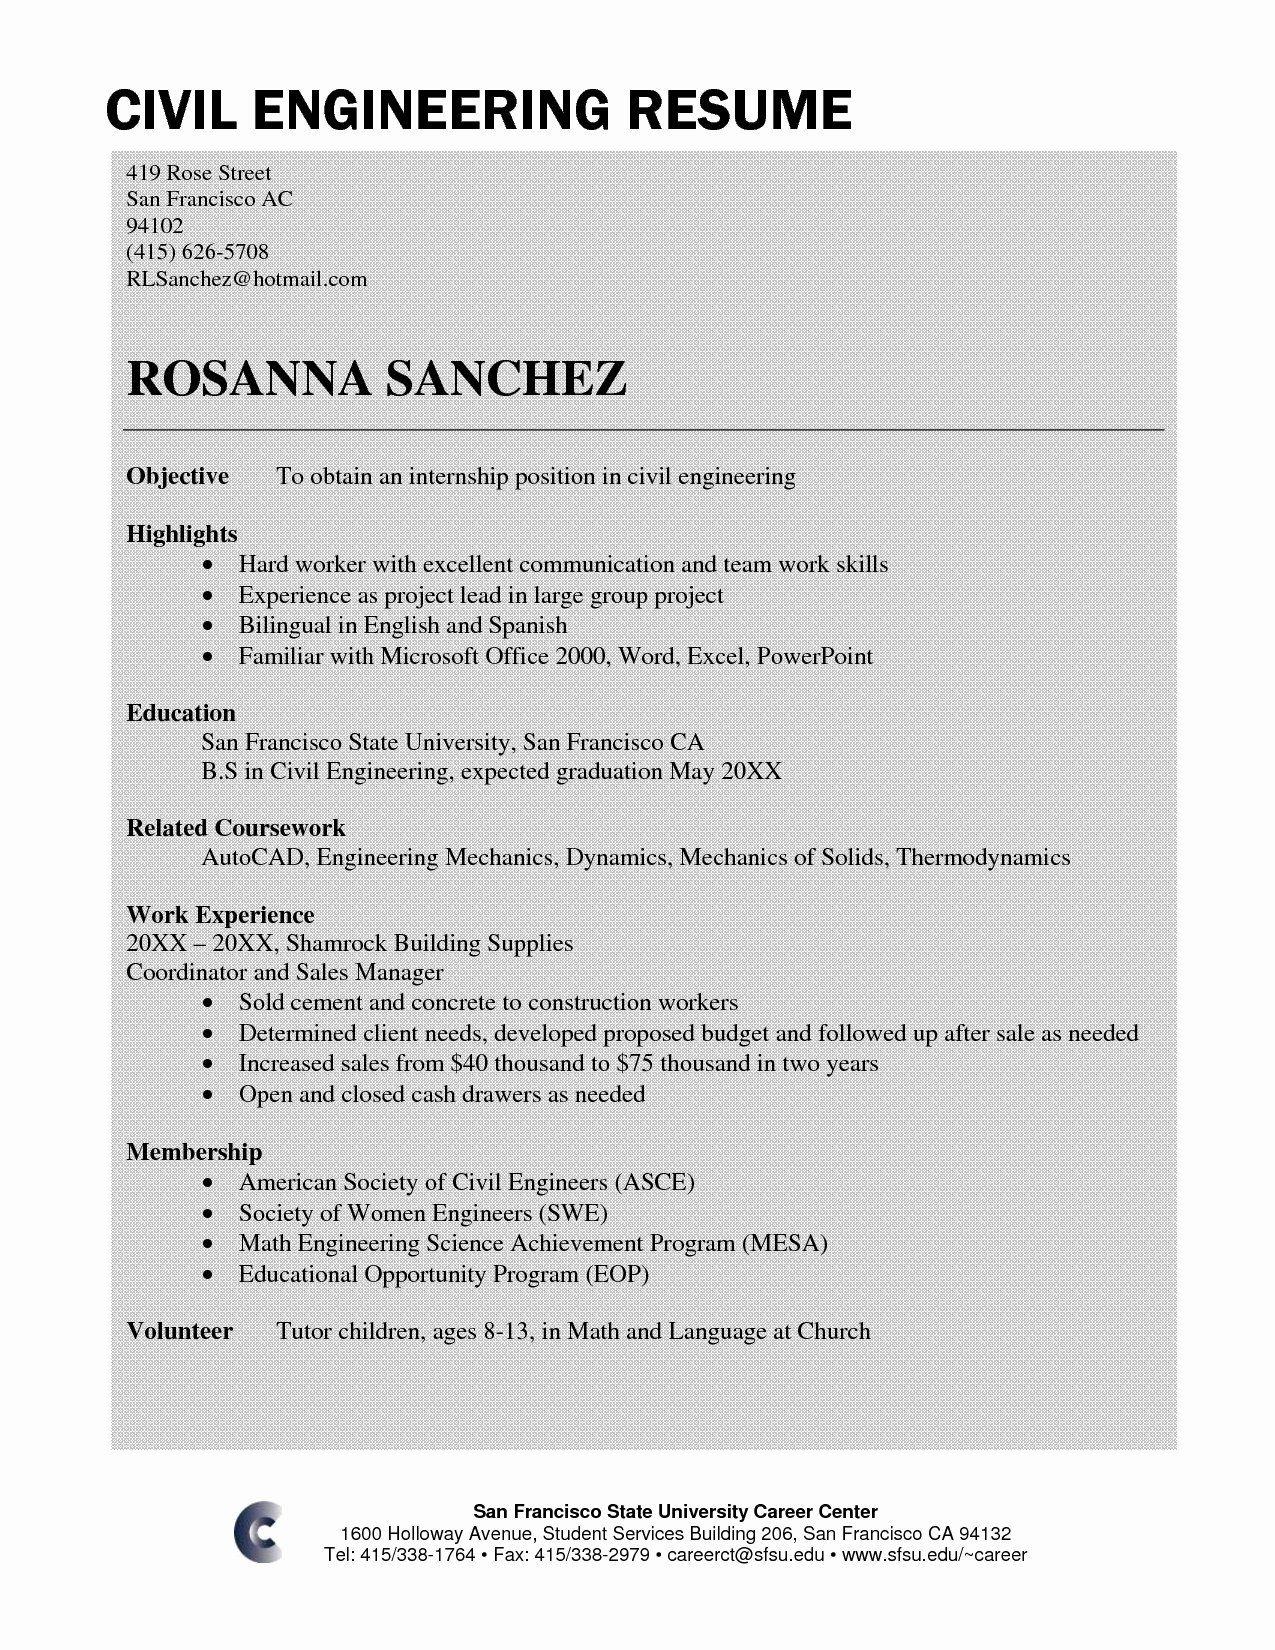 Civil engineer resume sample fresh civil engineer resume